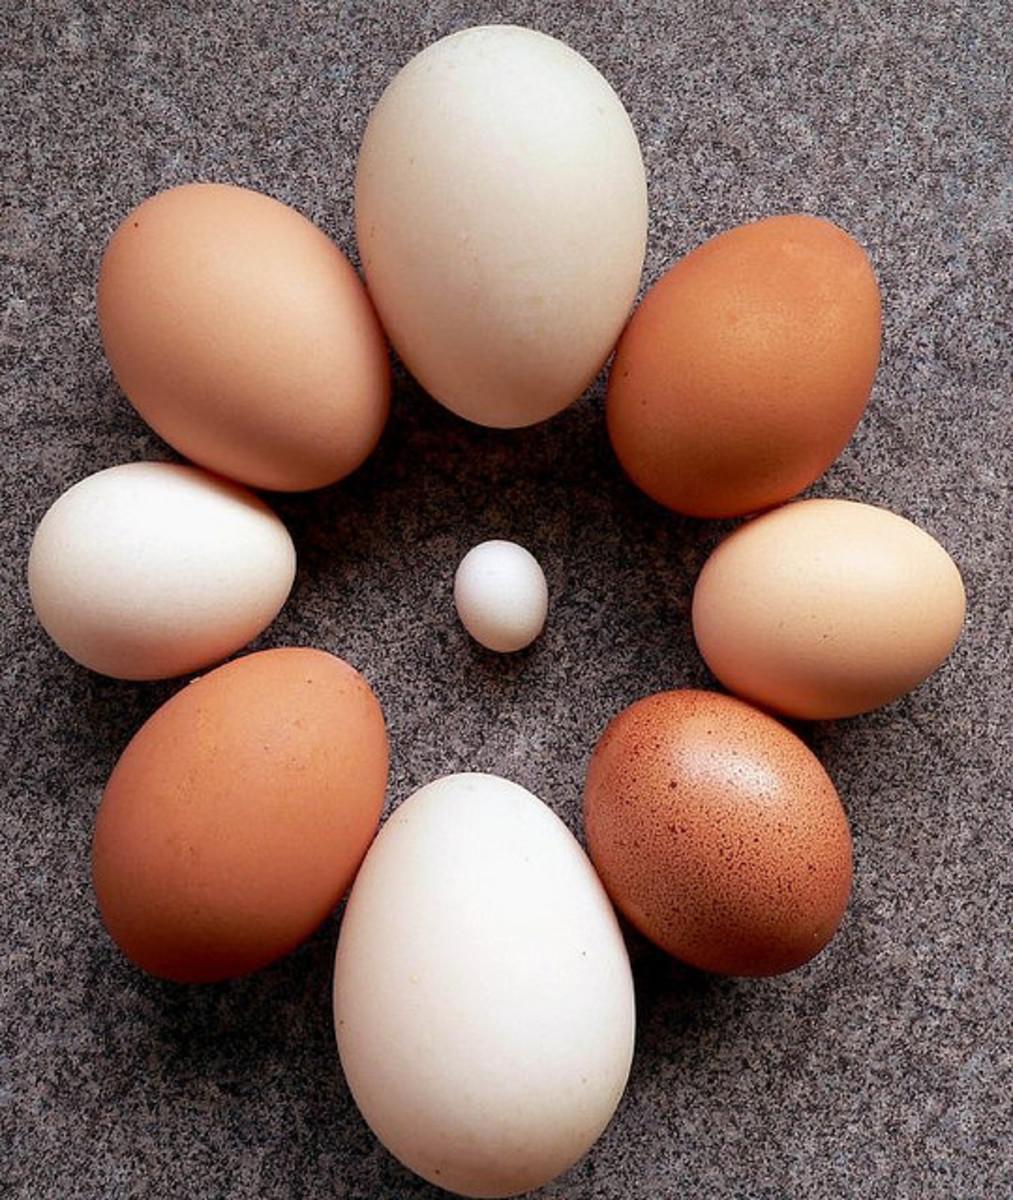 How an Egg is Formed - Egg Anomalies - Abnormal Eggs - Egg-cellent Information